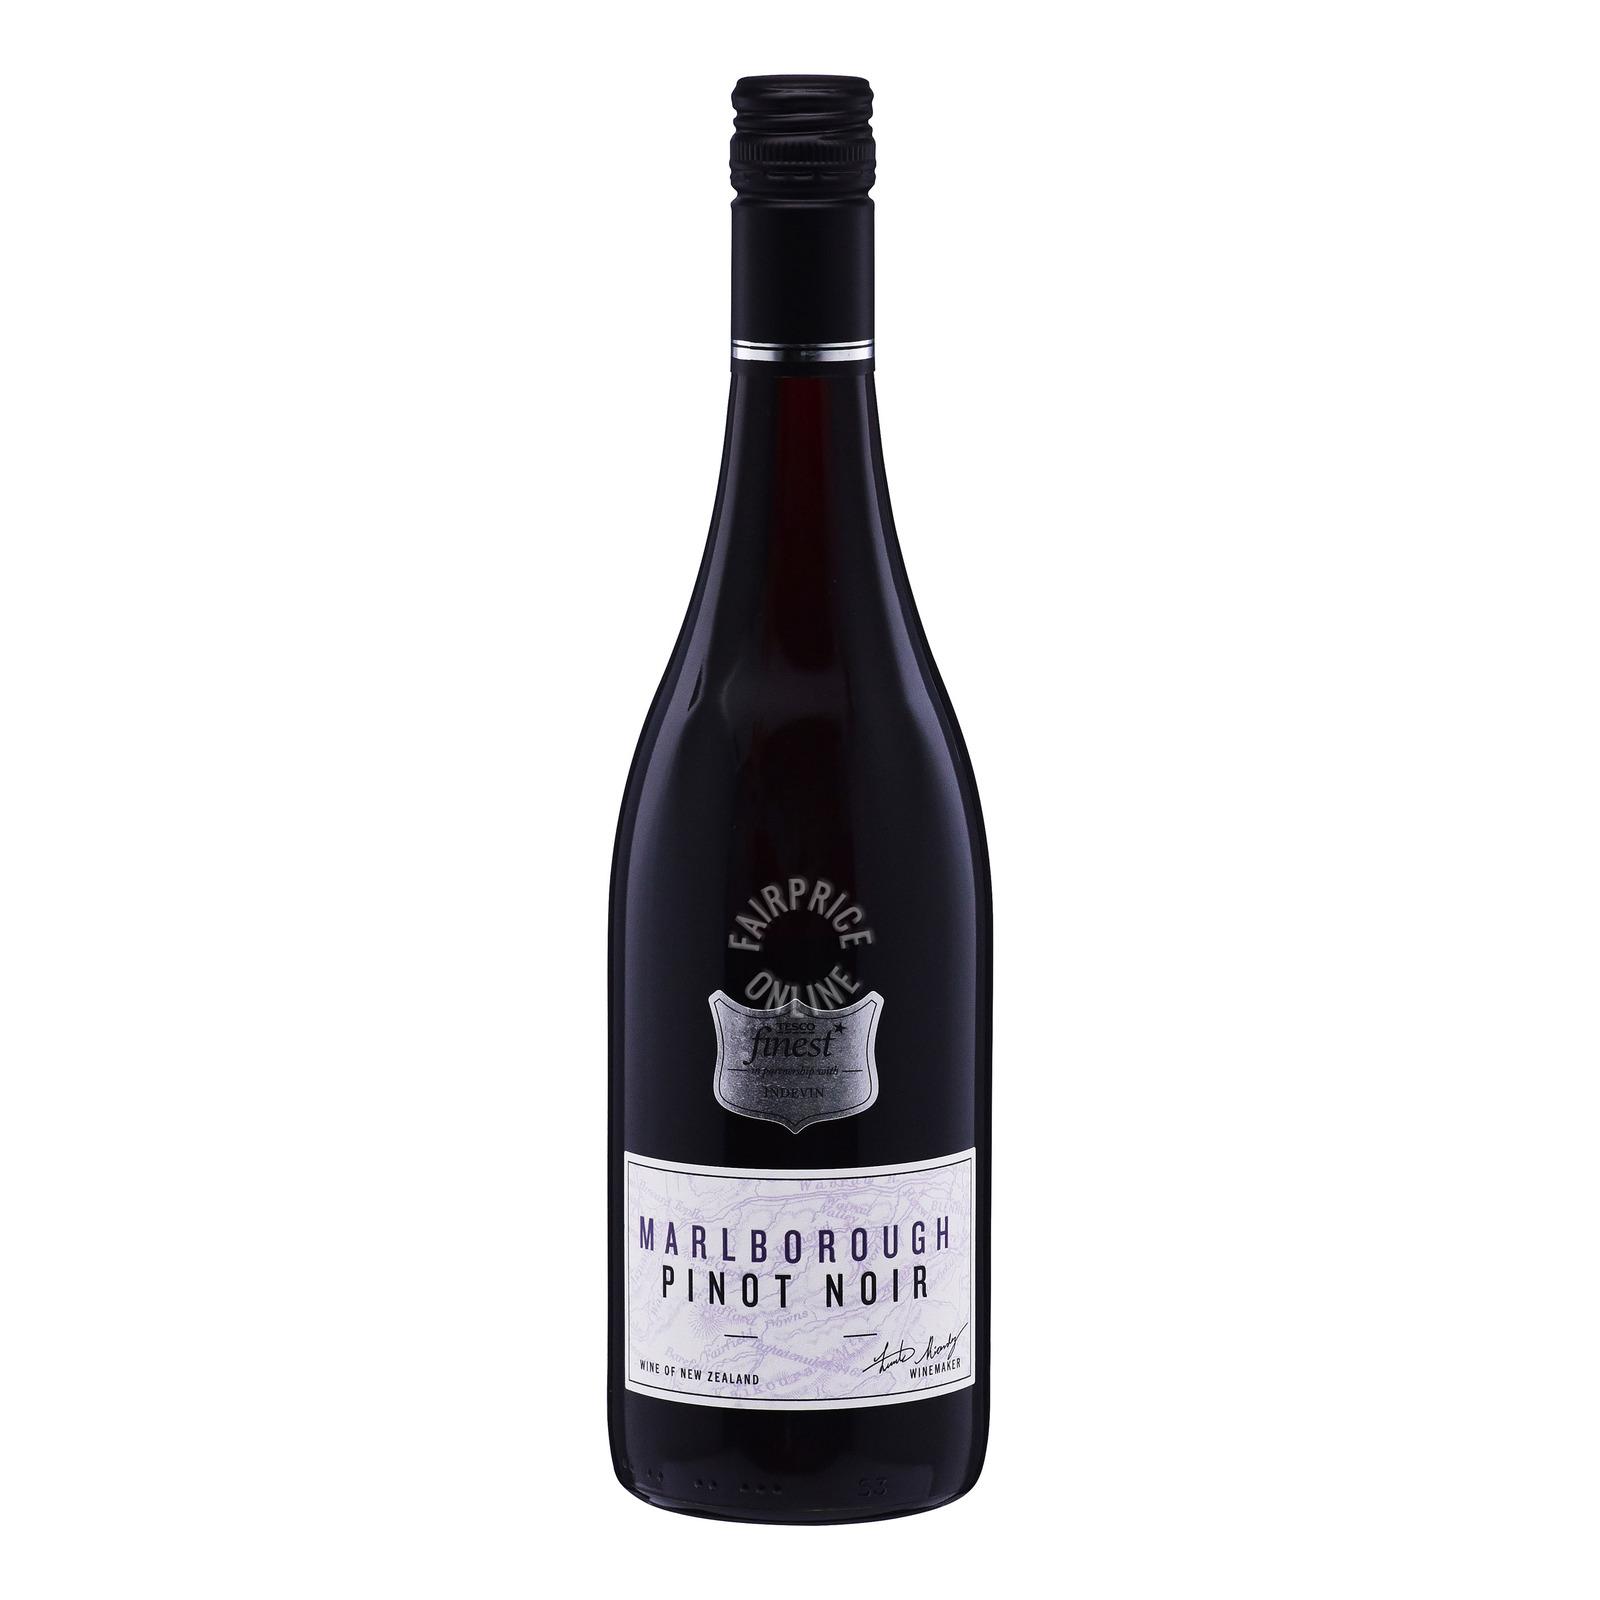 Tesco Finest Red Wine - Marlborough Pinot Noir